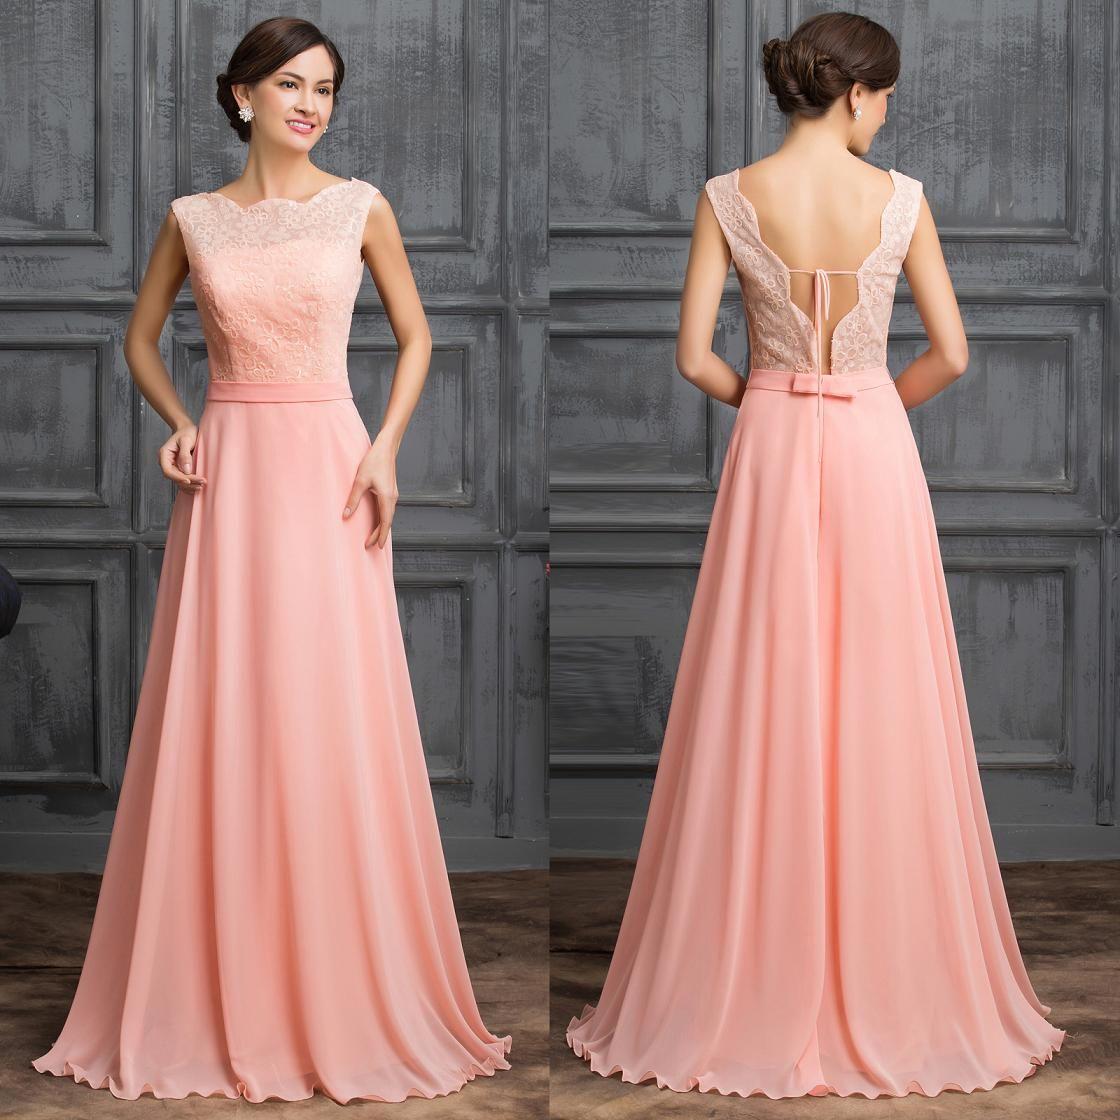 Grace Karin 2016 Light Pink Chic Long Evening Dress Bridesmaid ...